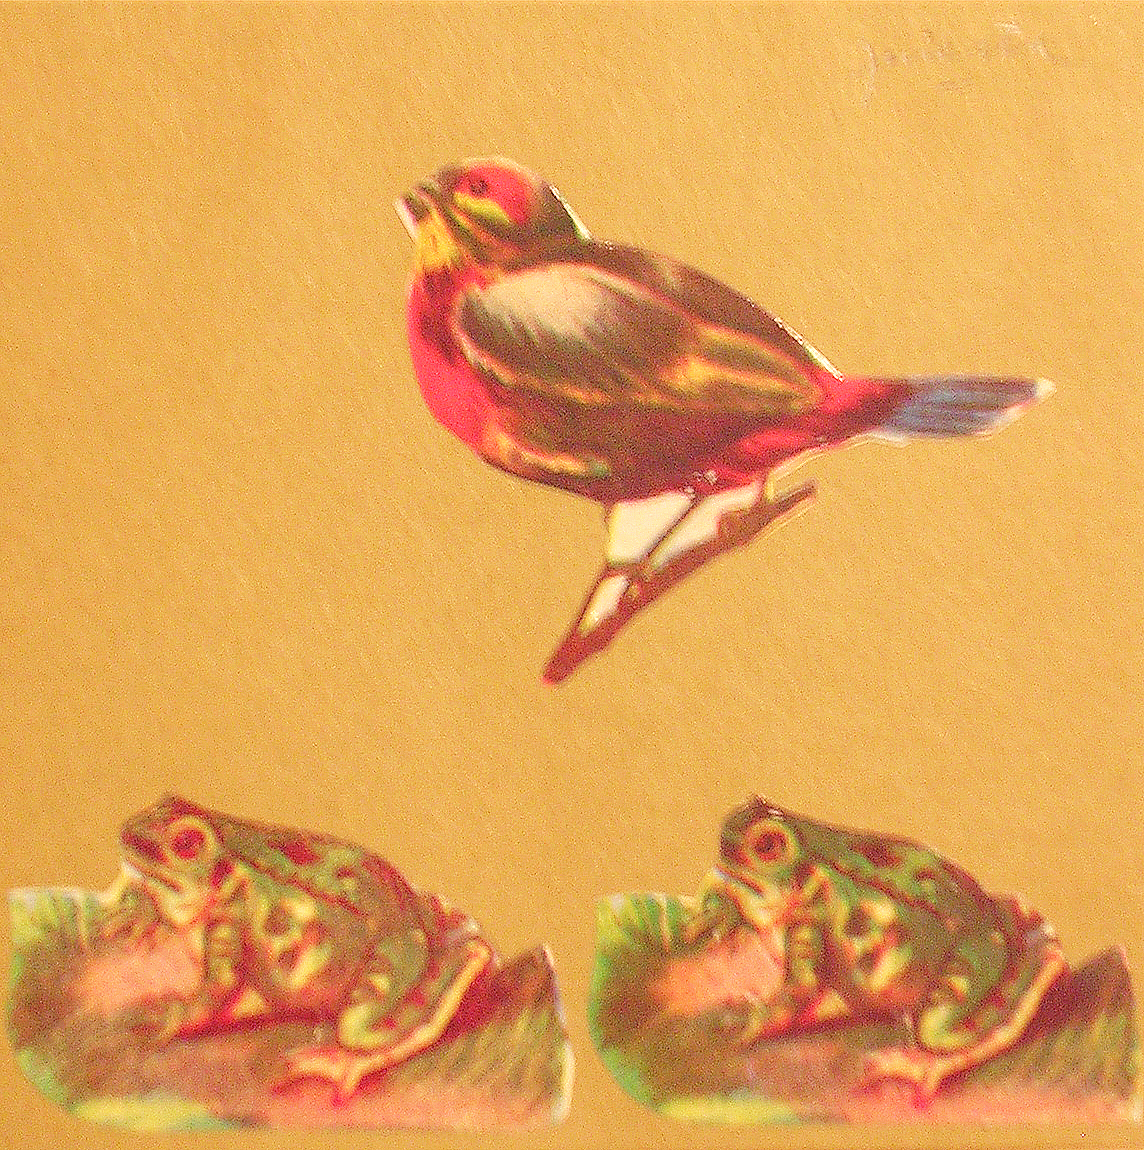 Sapos,  papel collage, 15 cm x 15 cm, 1999